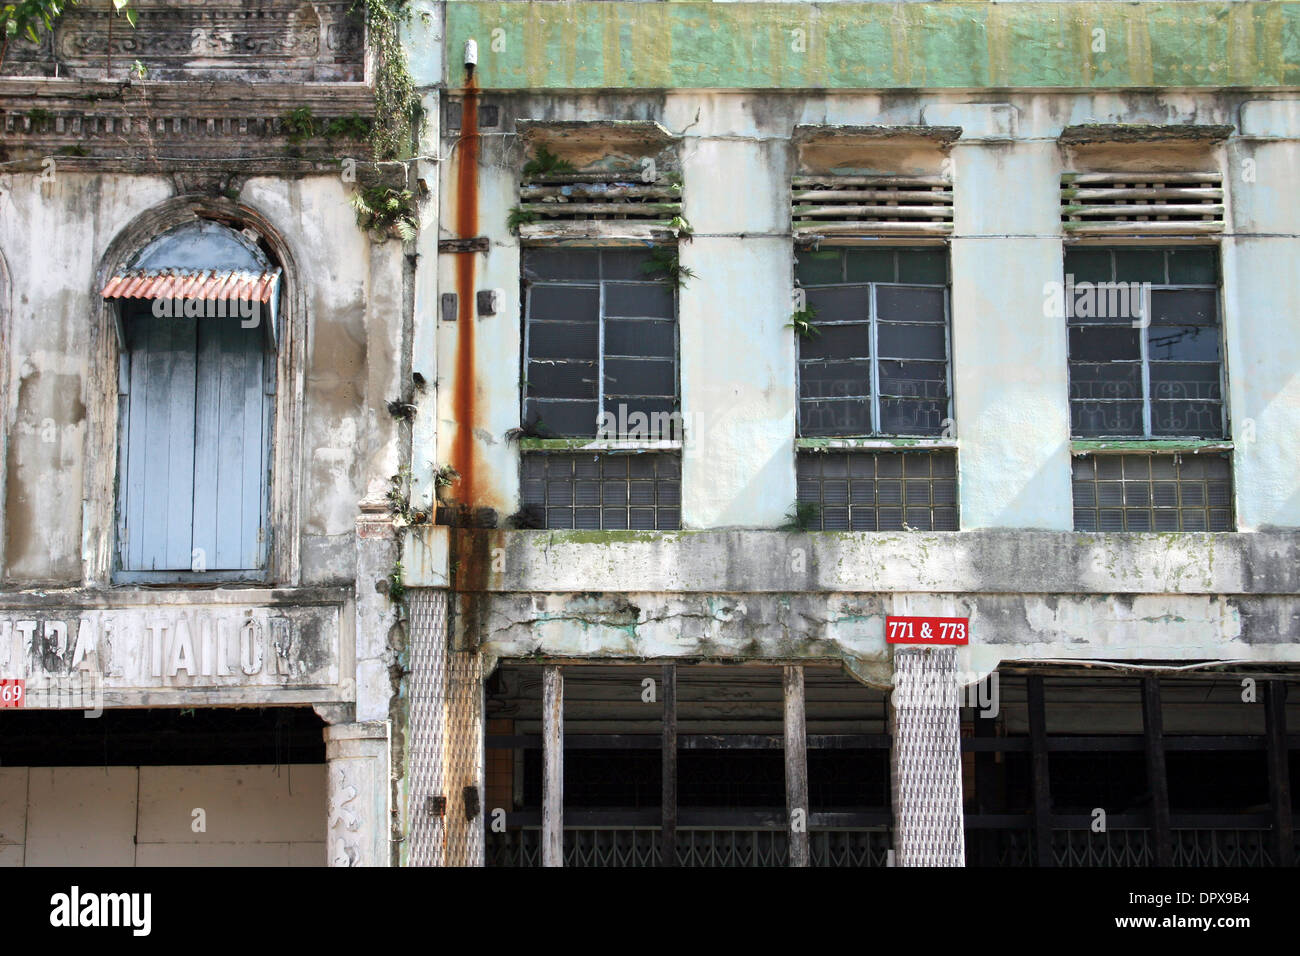 Derelict shopfronts in Singapore - Stock Image